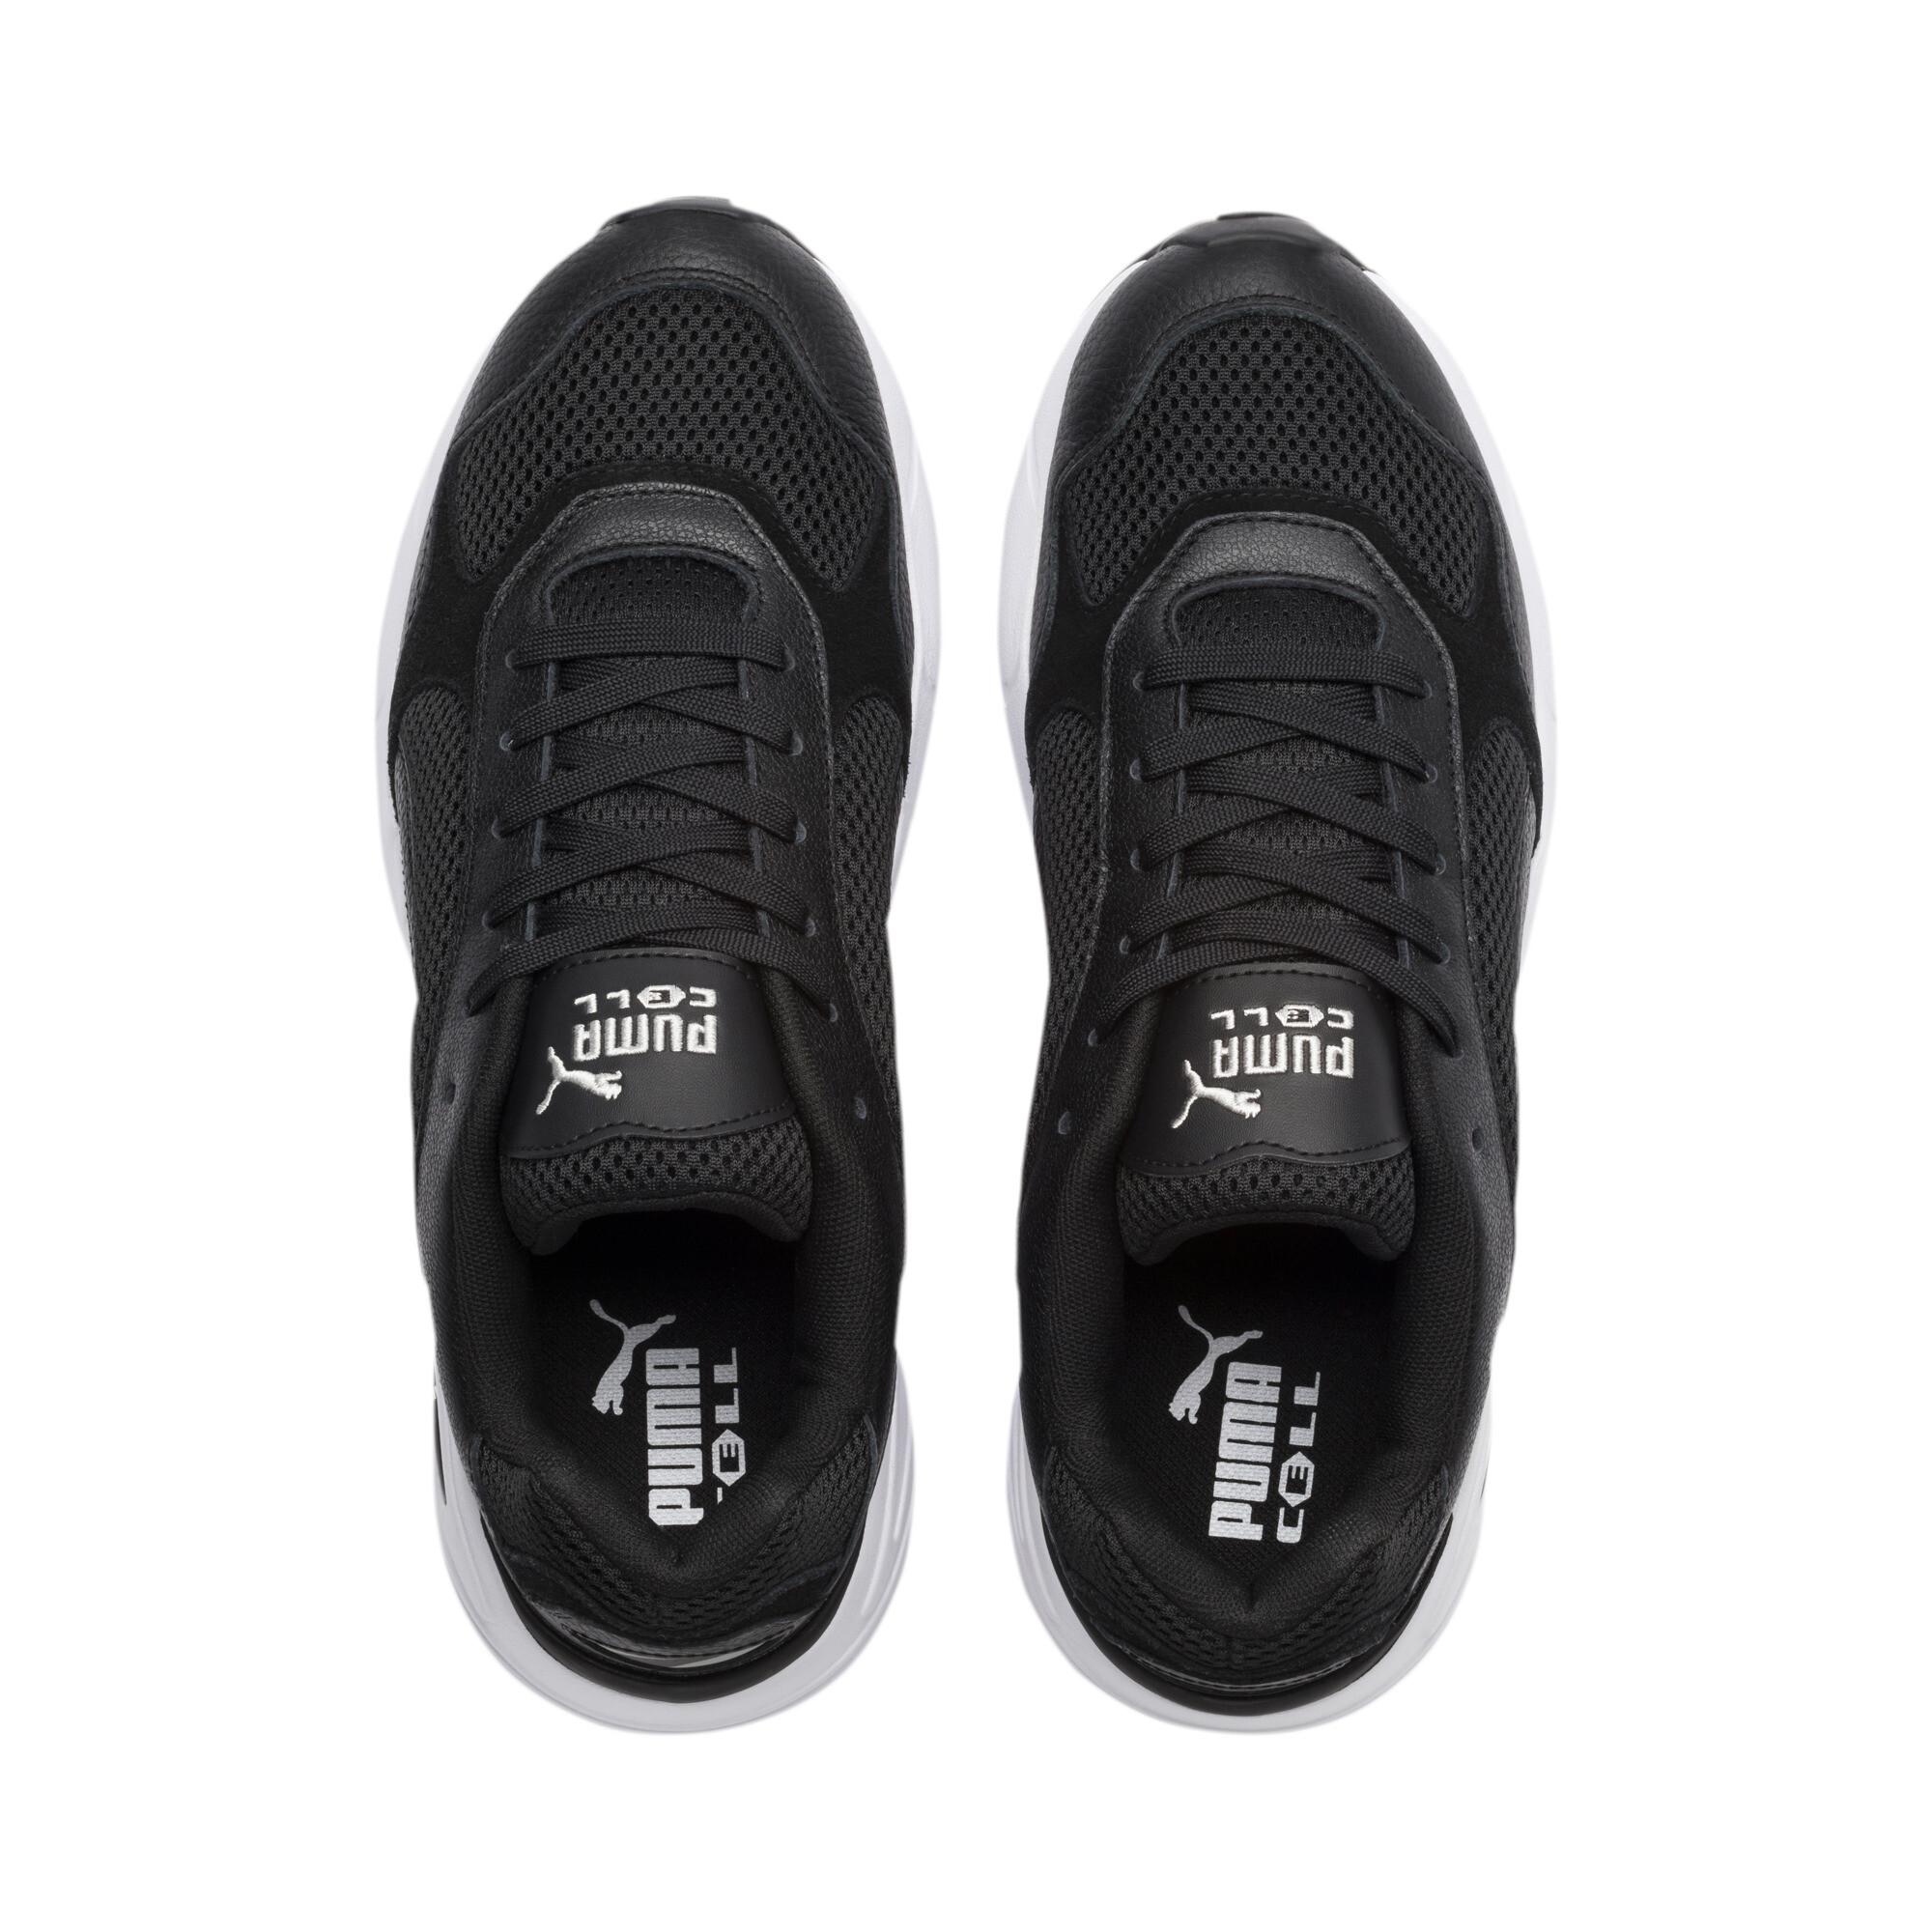 Indexbild 7 - PUMA CELL Viper Leather Sneaker Unisex Schuhe Sport Classics Neu